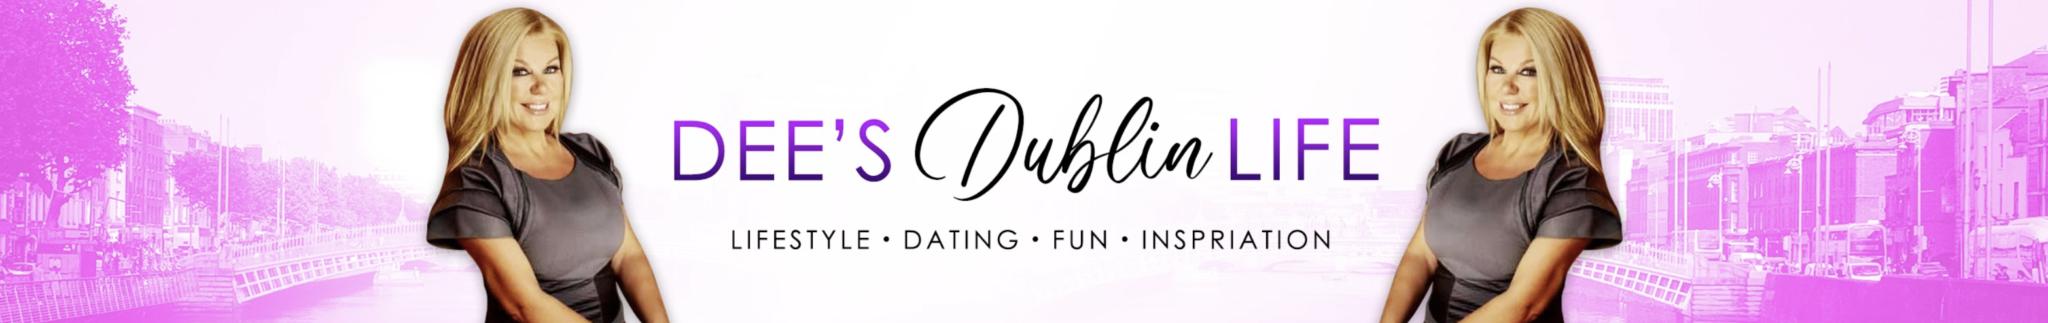 dees Dublin life